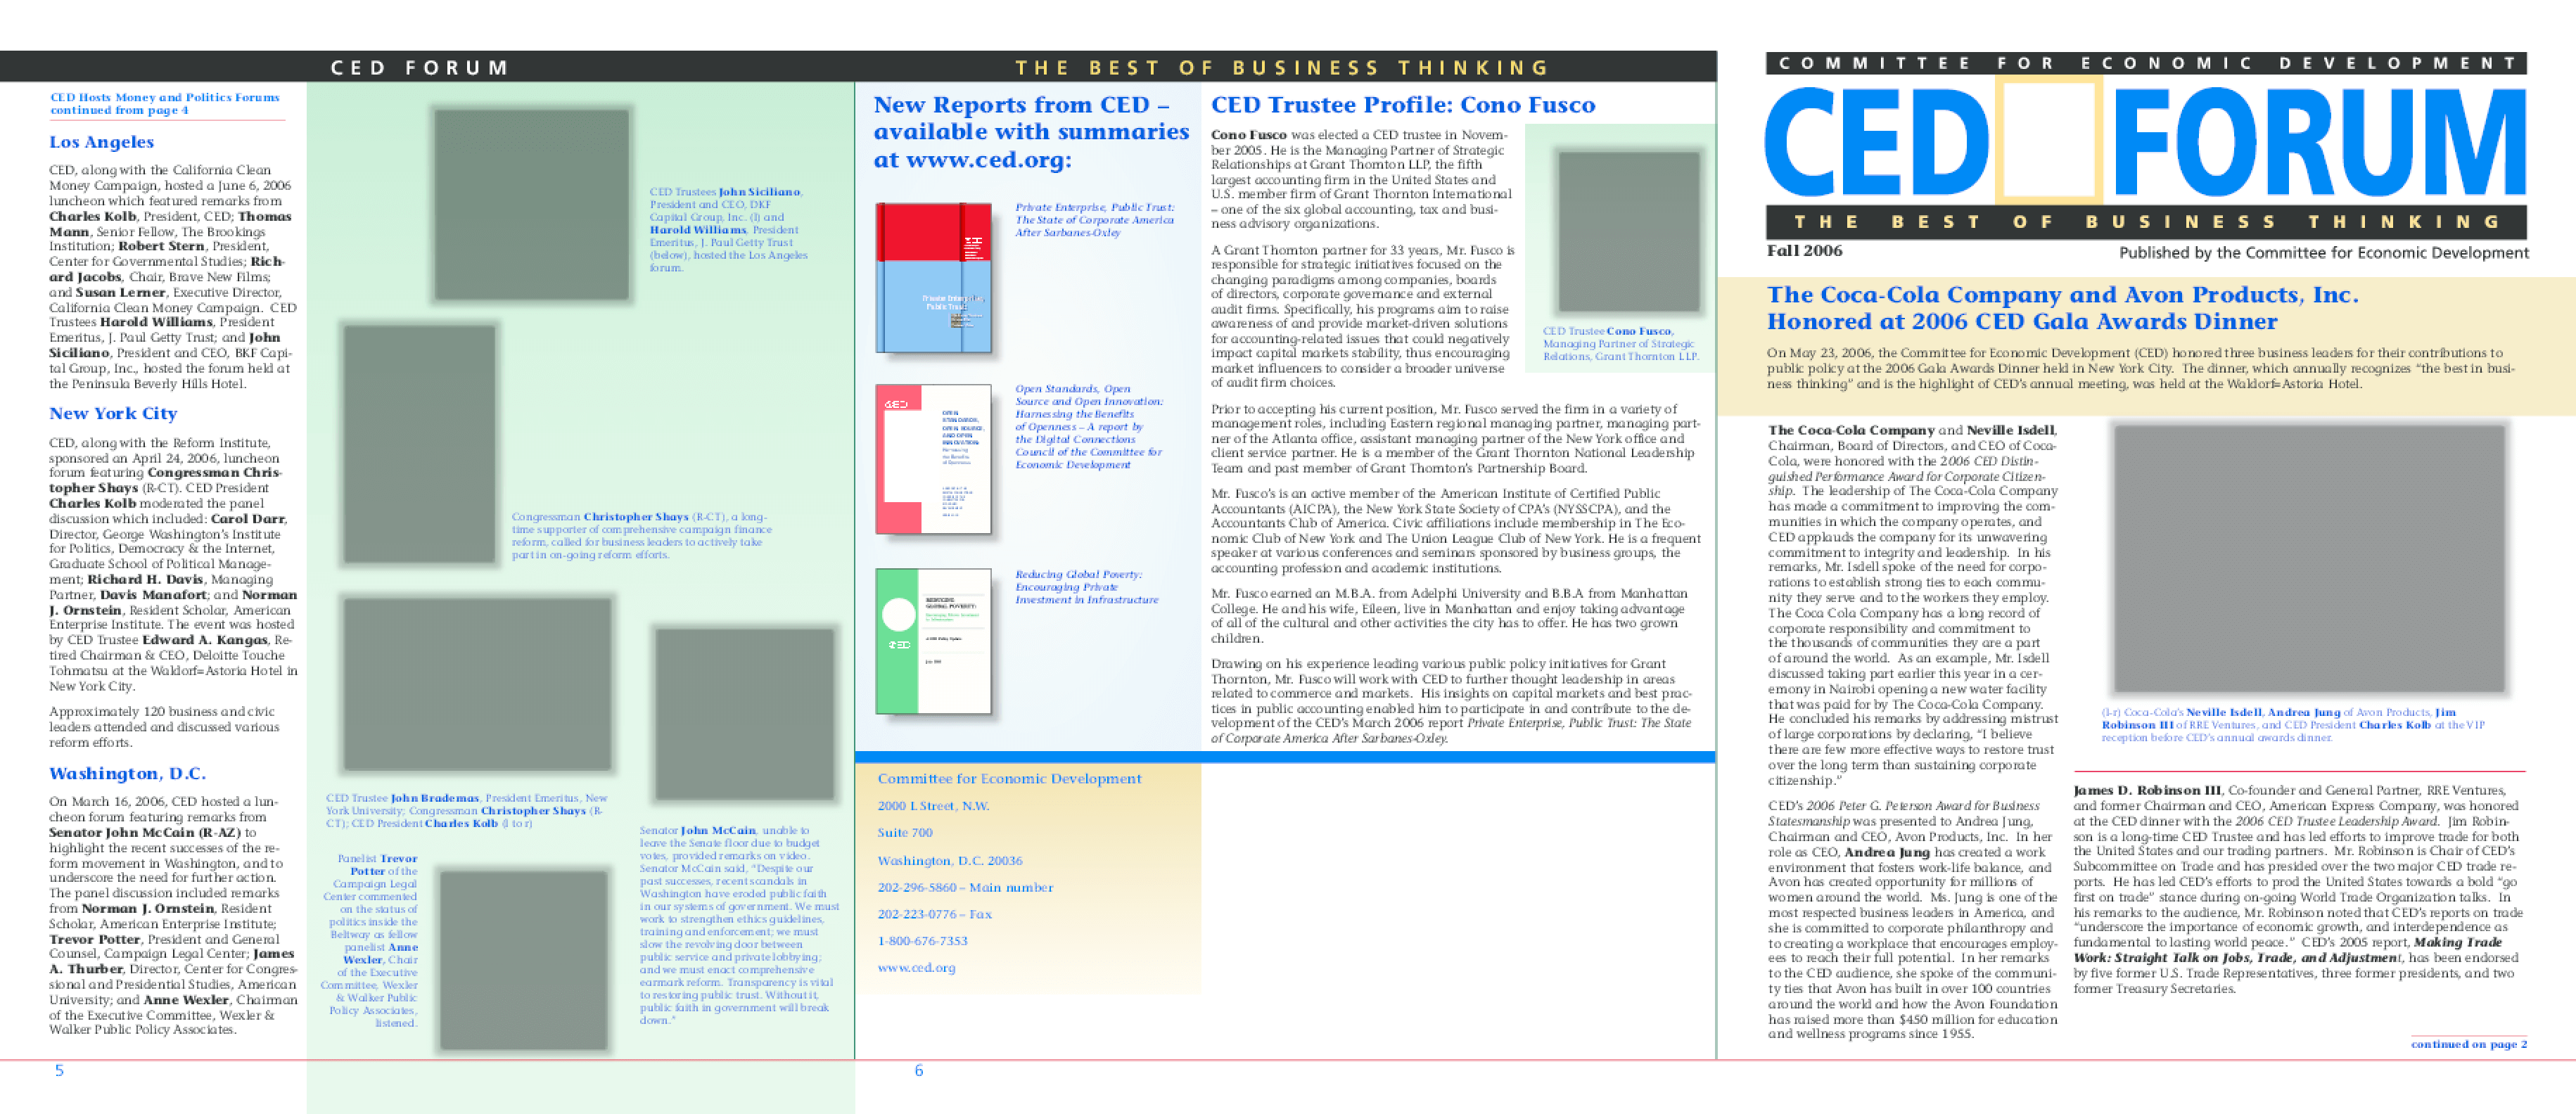 CED FORUM: Fall 2006